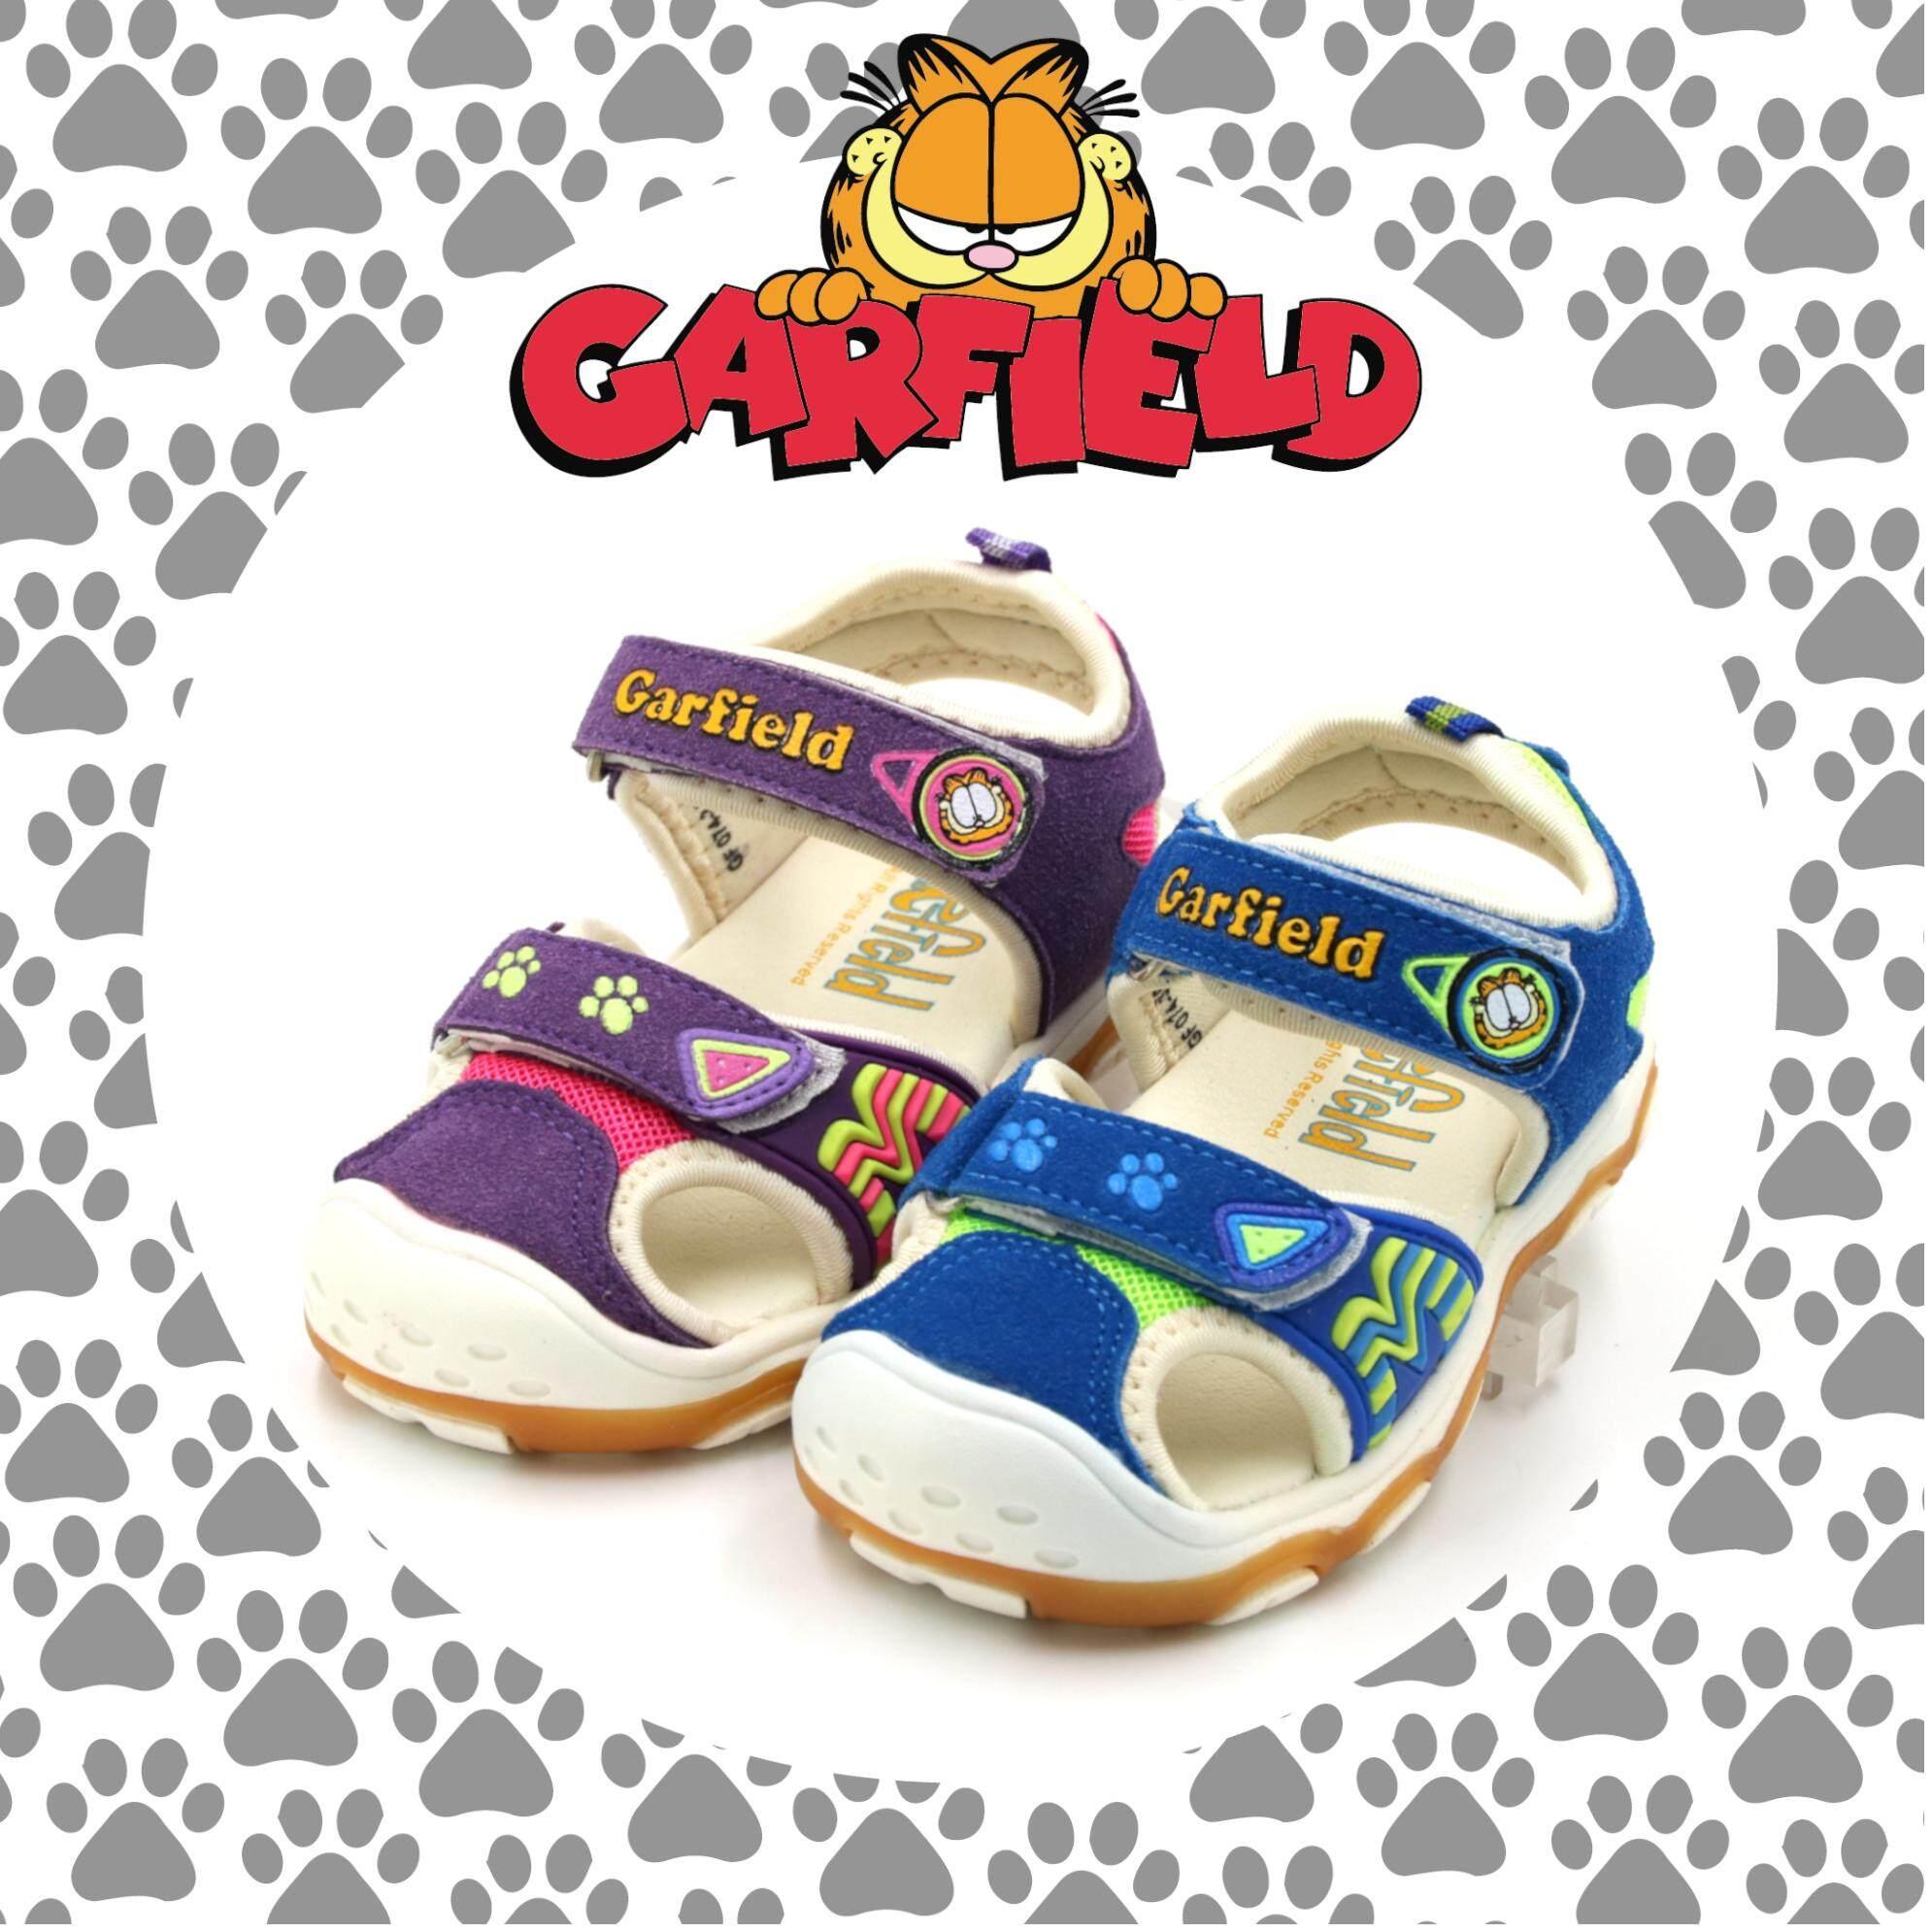 Garfield Baby Boy Outdoor Running Sport Sandal Sandal Sukan Jalan Lari Bayi Lelaki 13 5 16 5cm 2 Colors Paws Pu Lazada